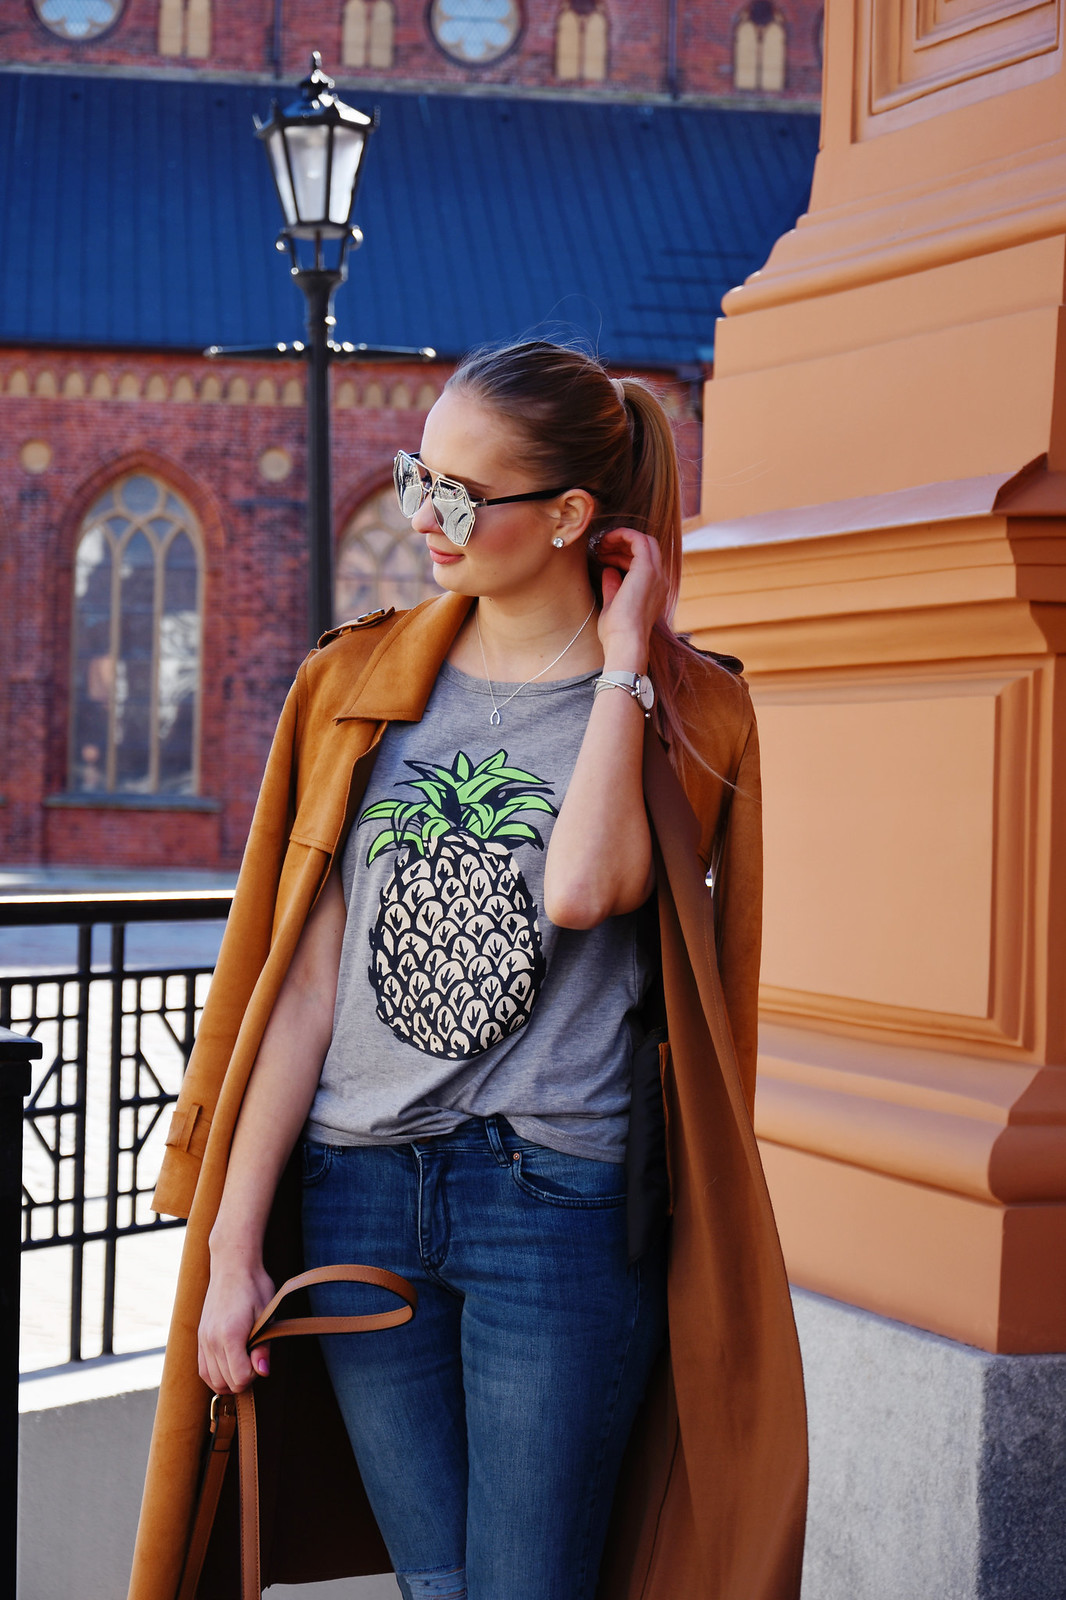 Pineapple print shirt from Ebay